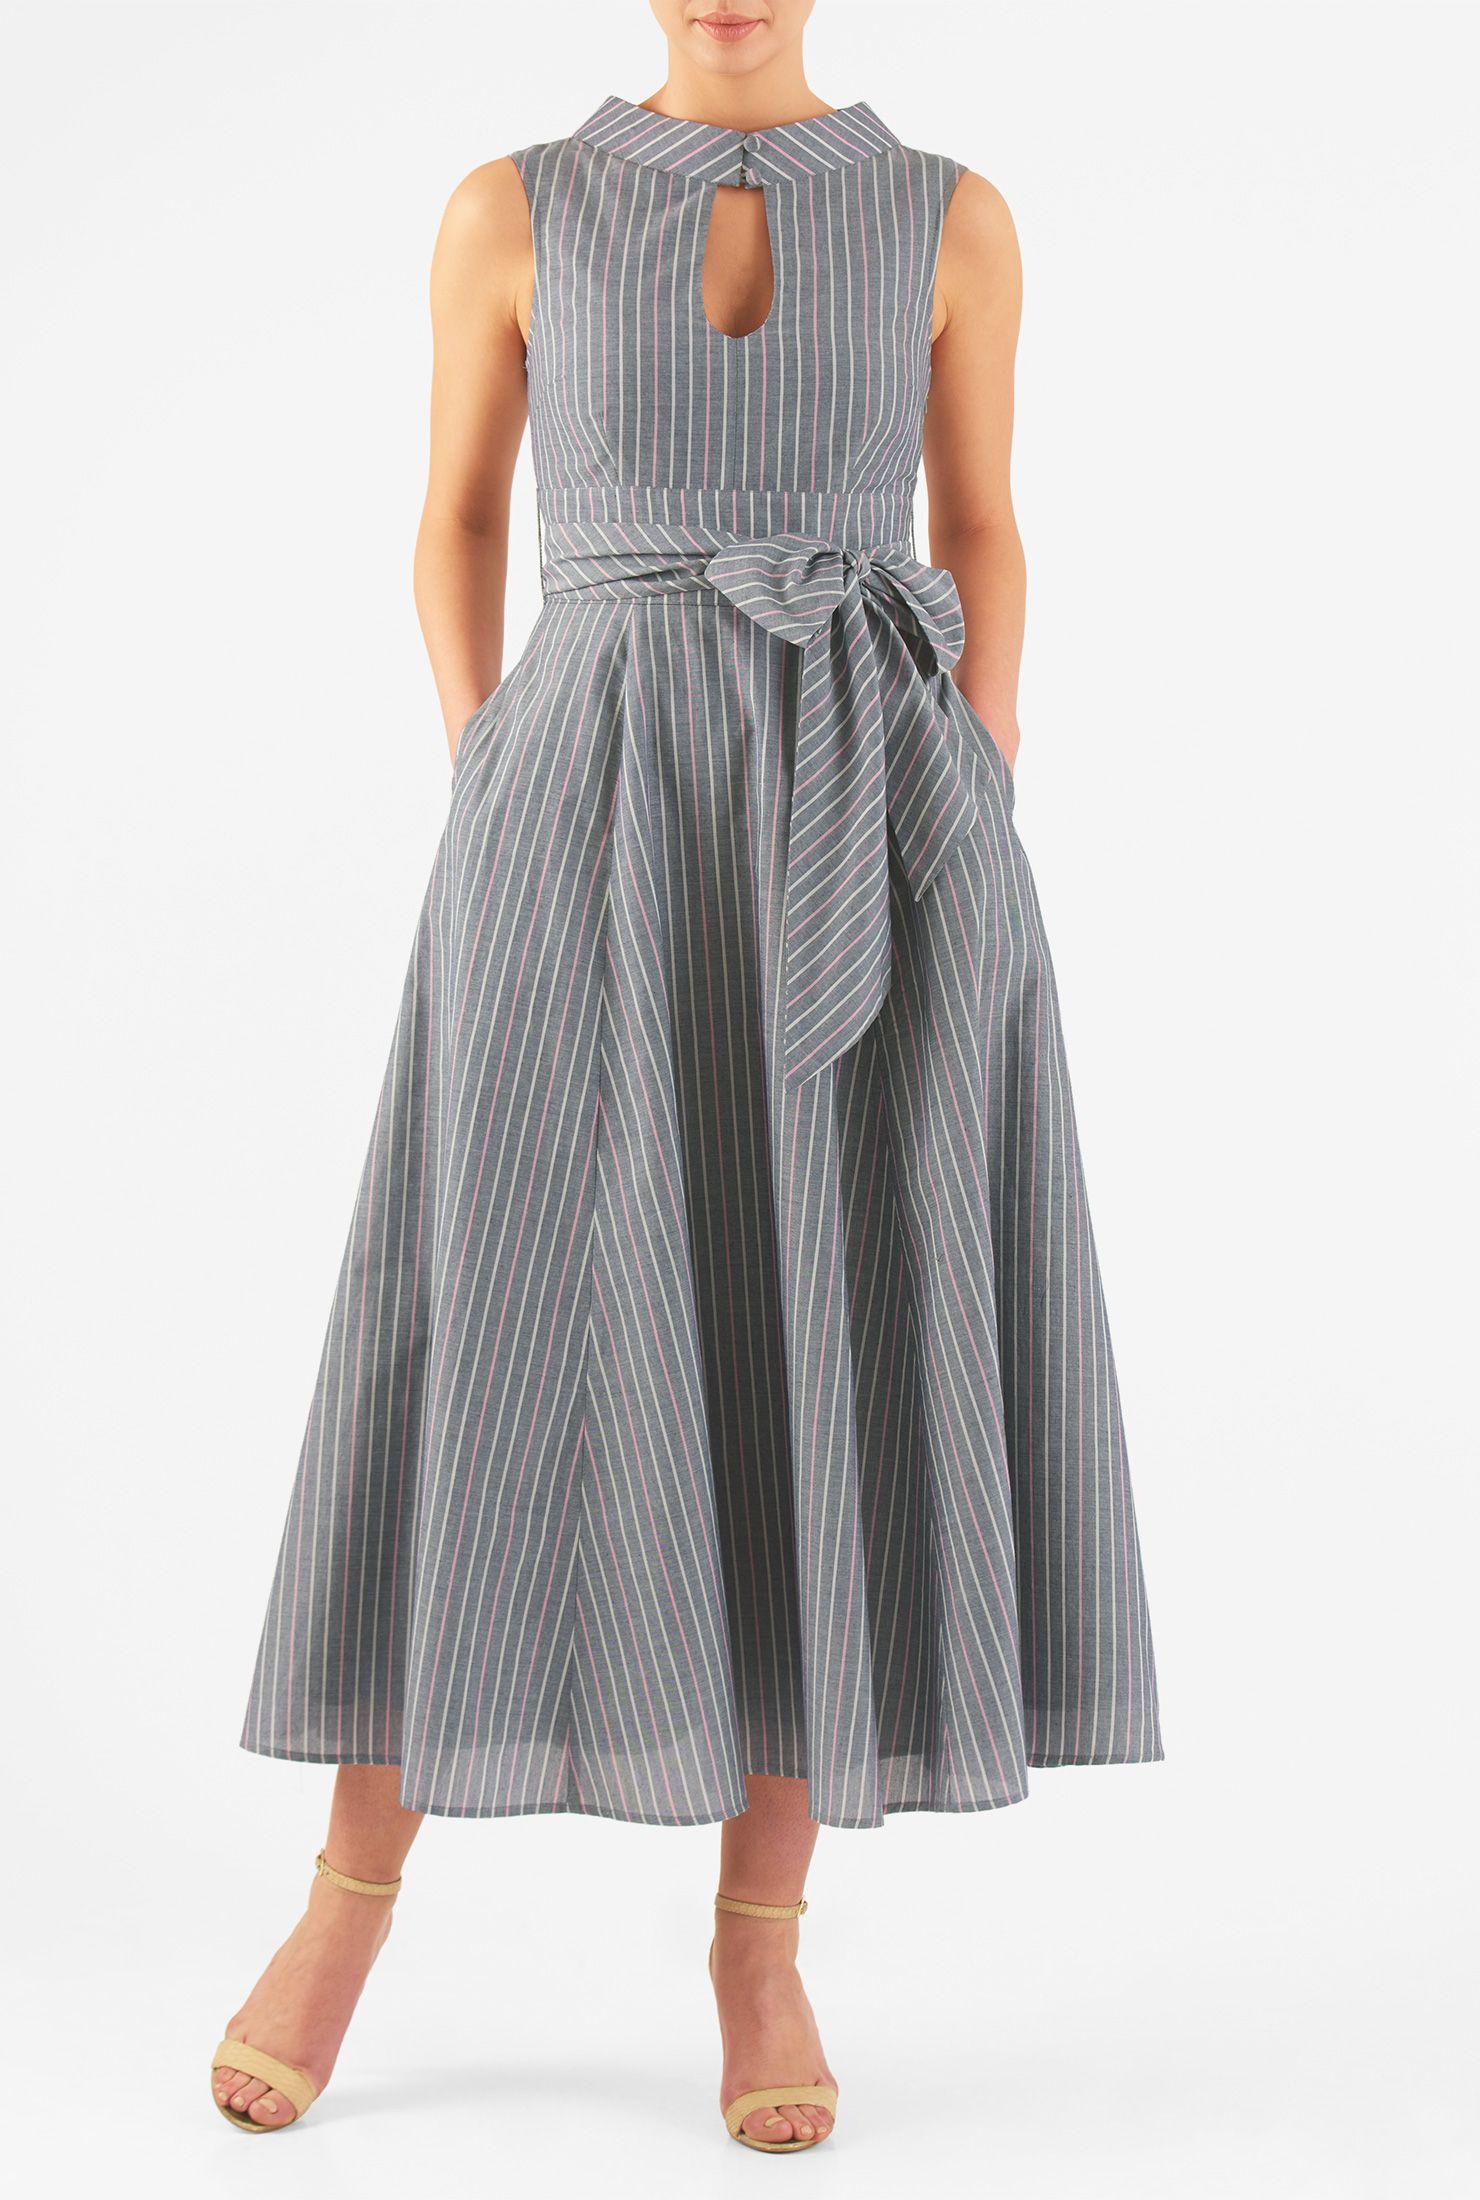 Banded high neck chambray stripe midi dress